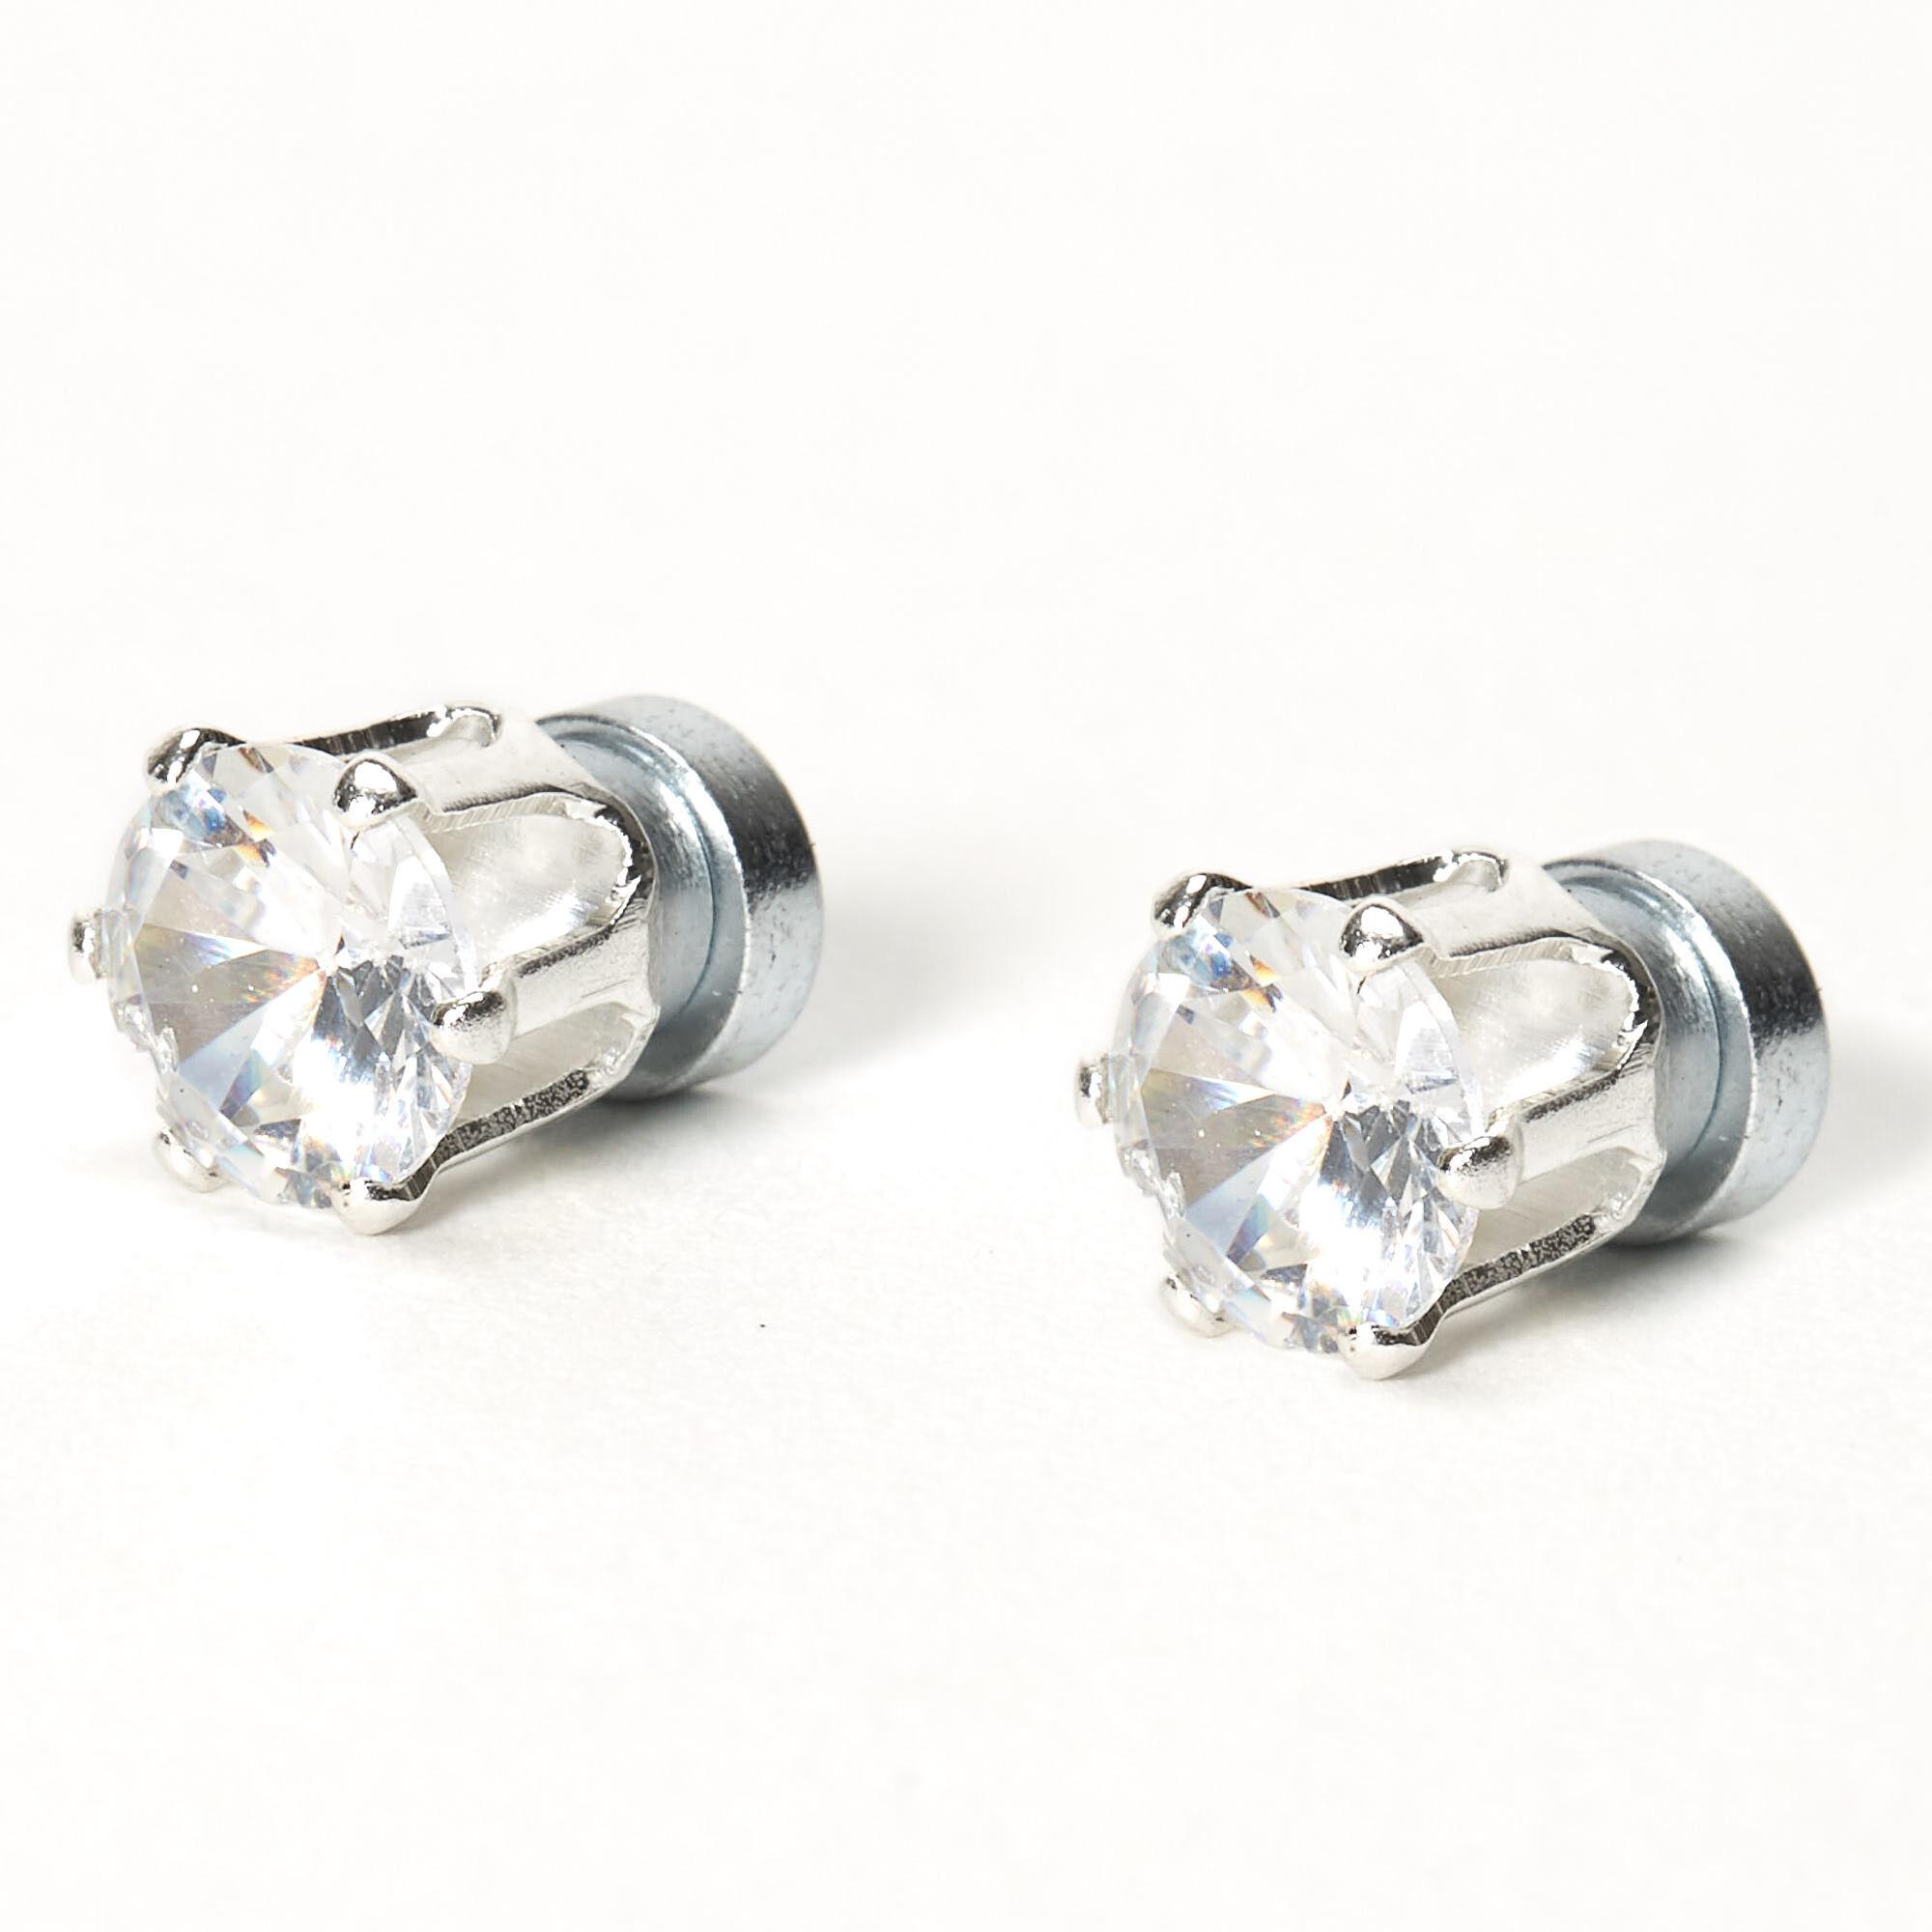 Sterling Silver Reversible 10mm Synthetic Shell Pearl /& 6mm CZ Stud Earrings